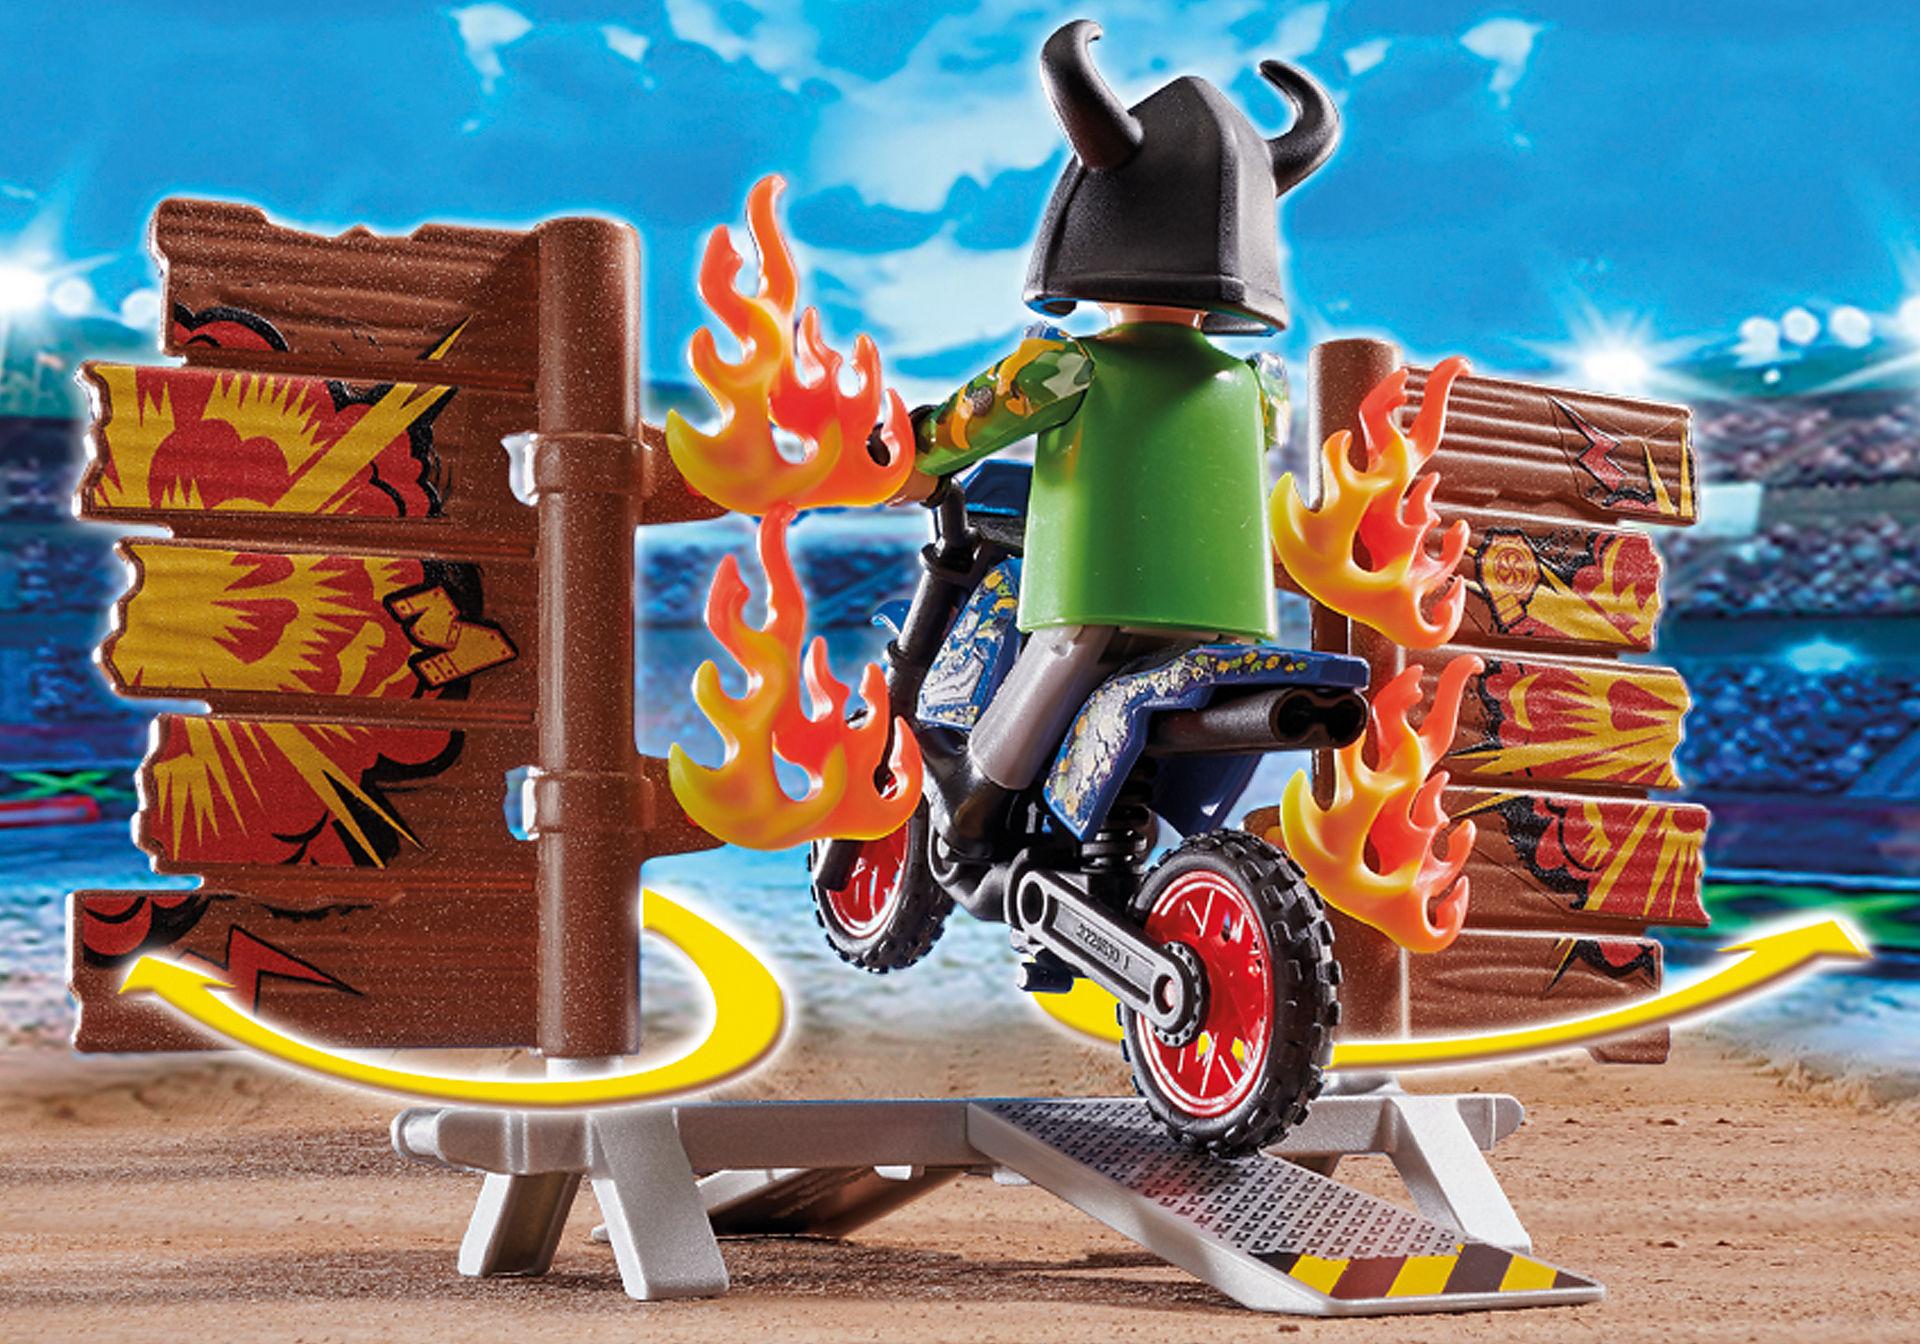 70553 Stuntshow Motorcykel med brandmur zoom image4